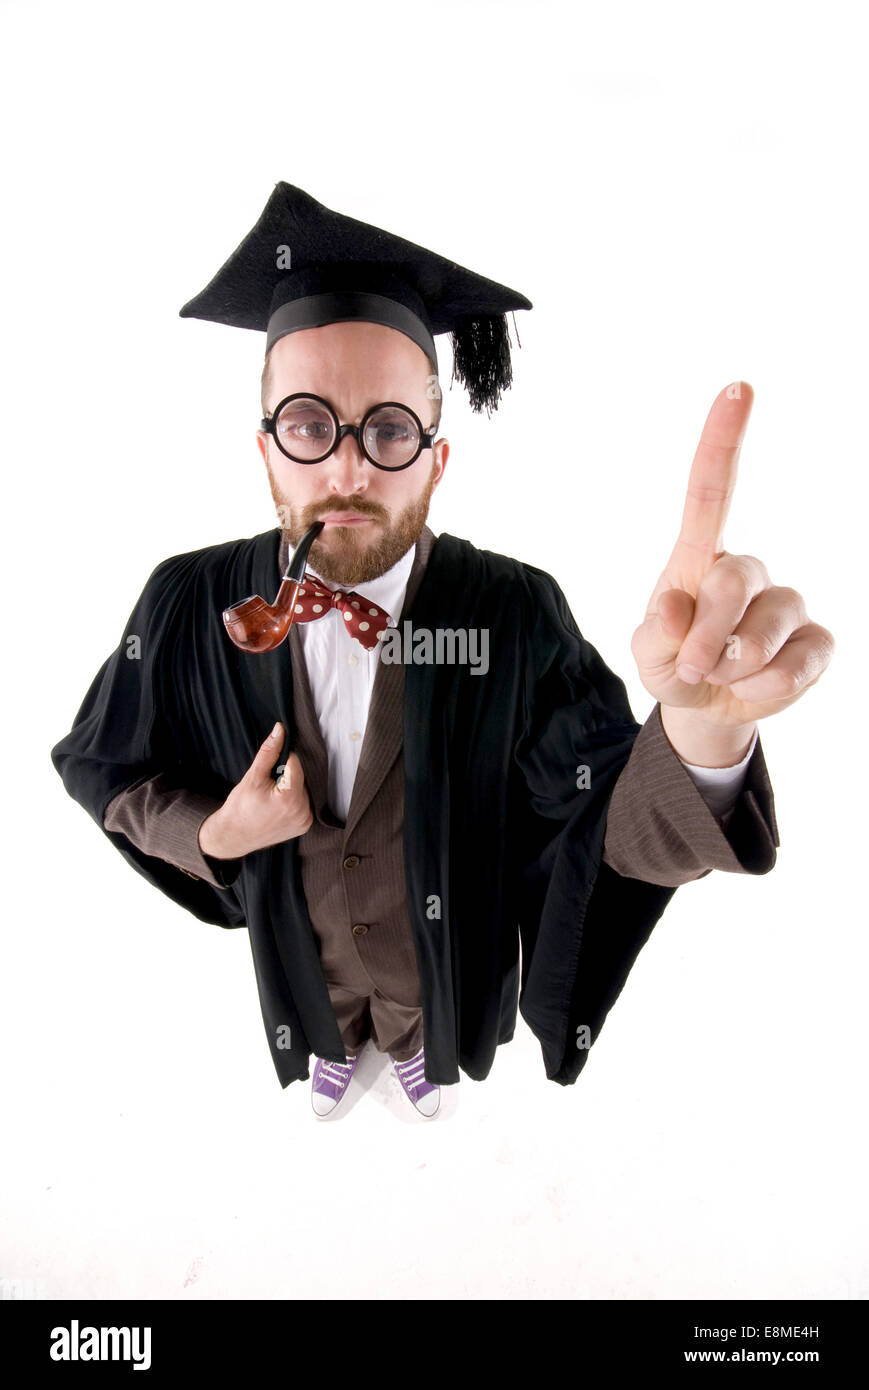 Funny man dressed in fancy dress as a comedy school professor with ...